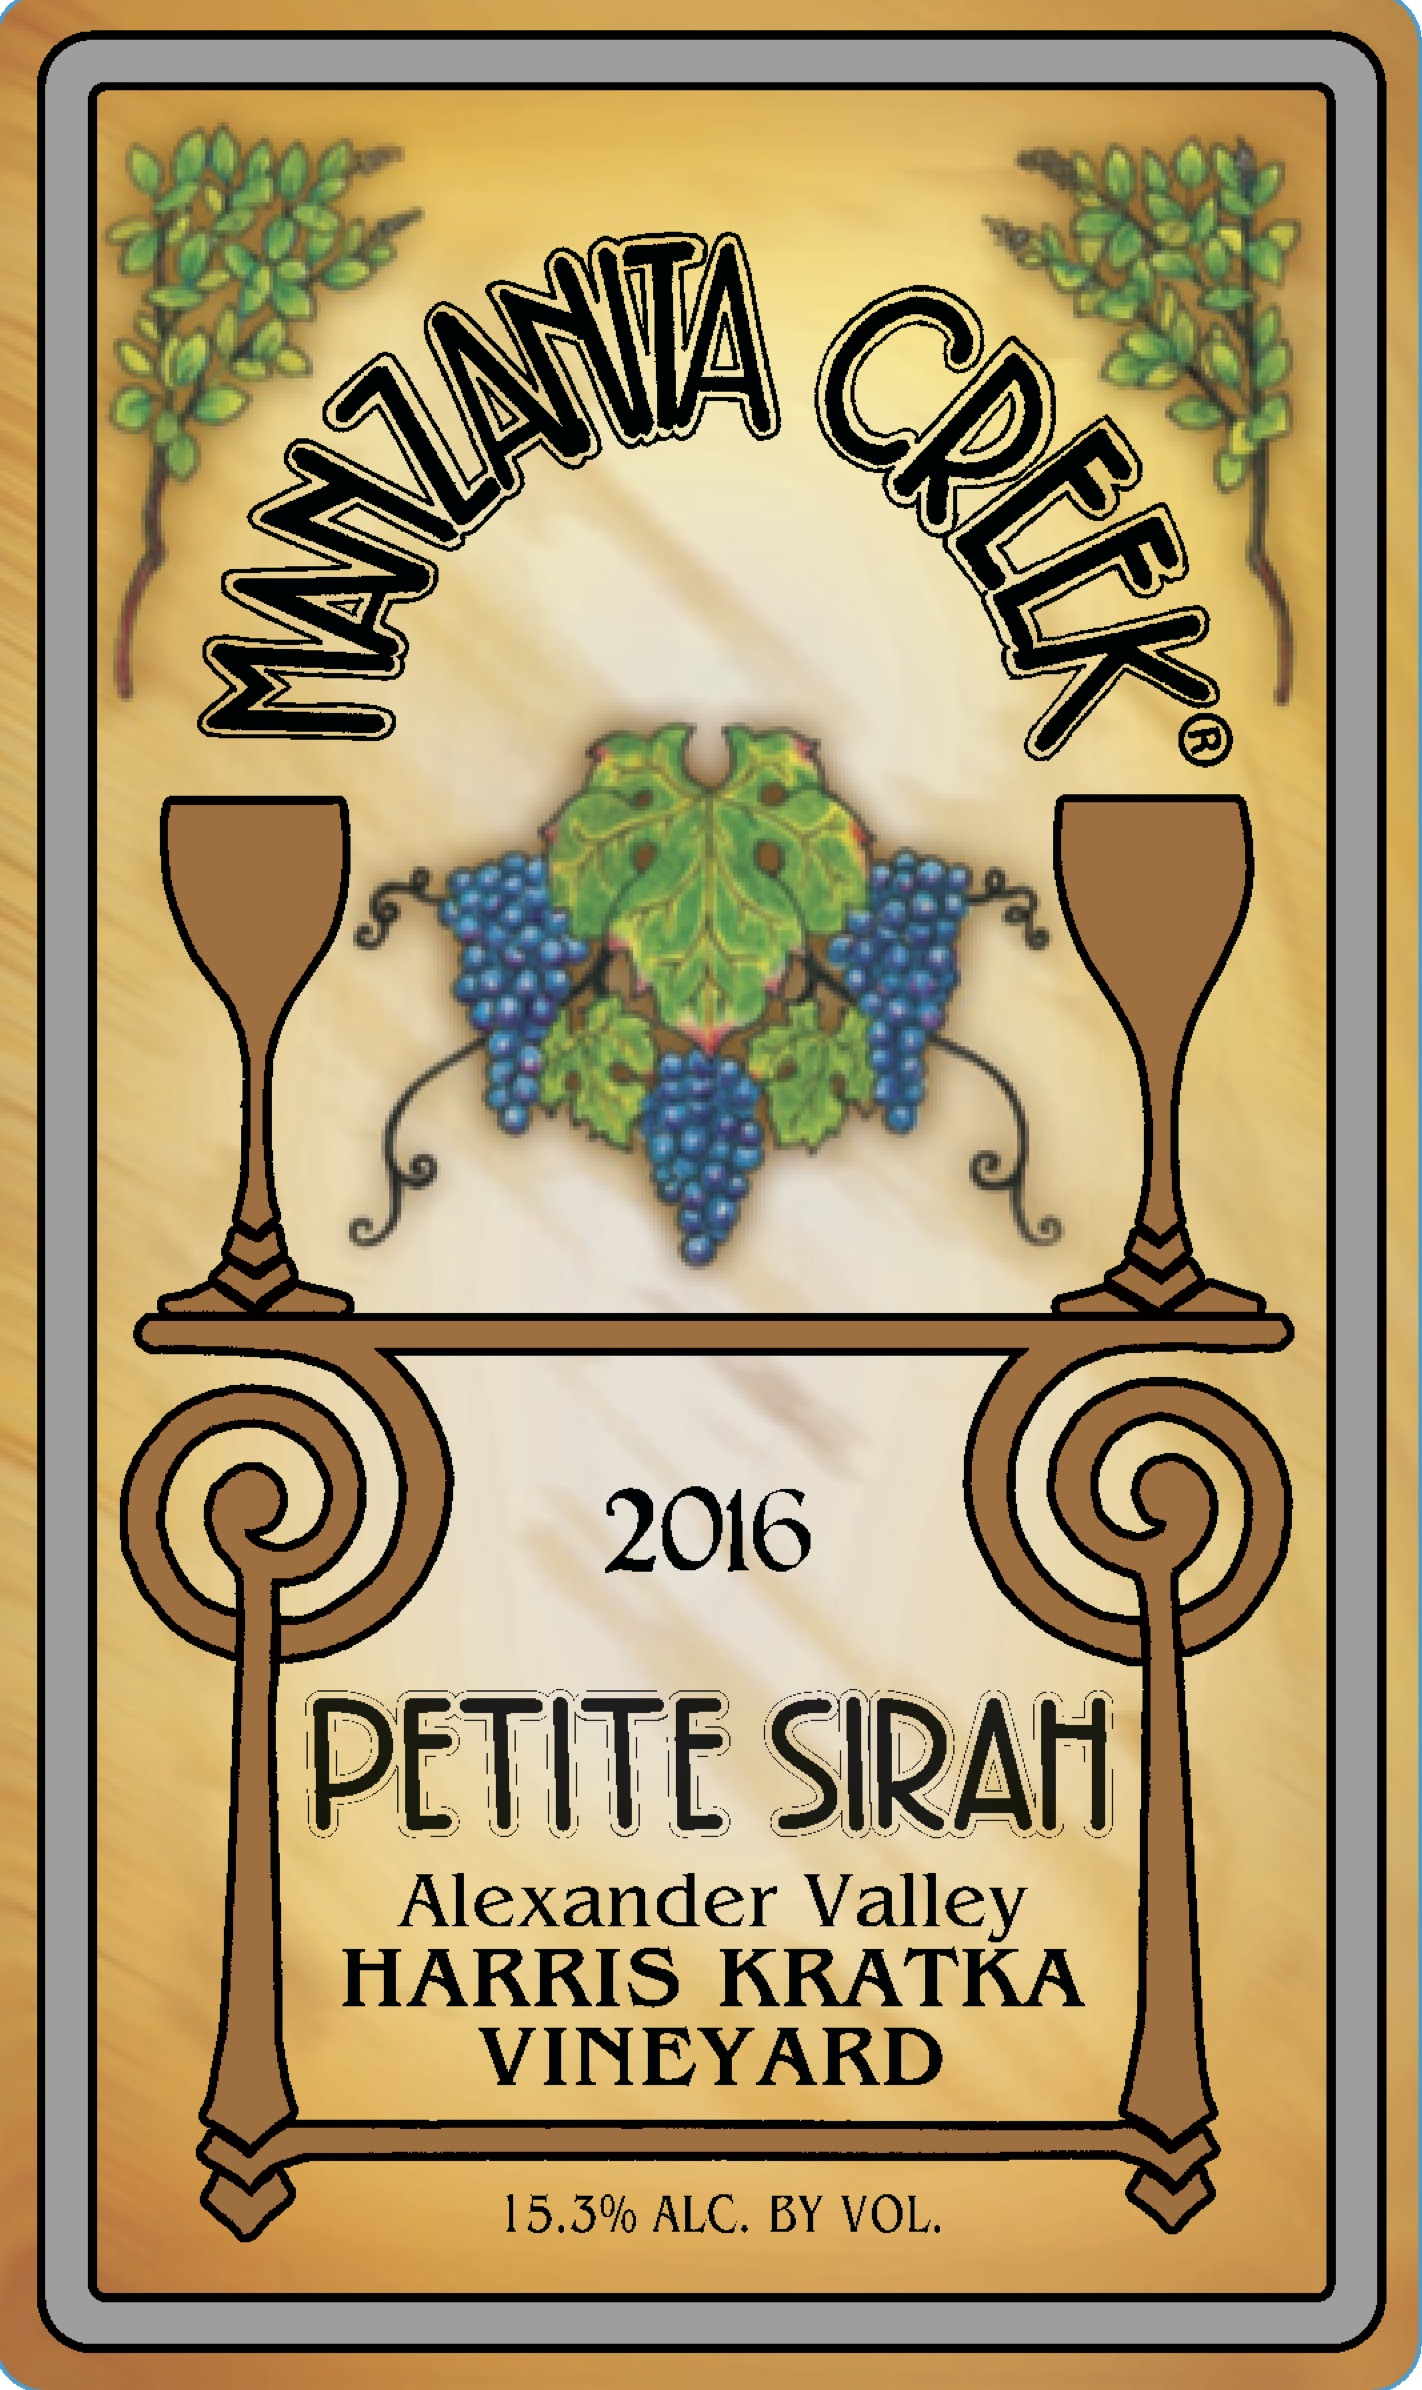 2016 Petite Sirah, Harris-Kratka,  Alexander Valley